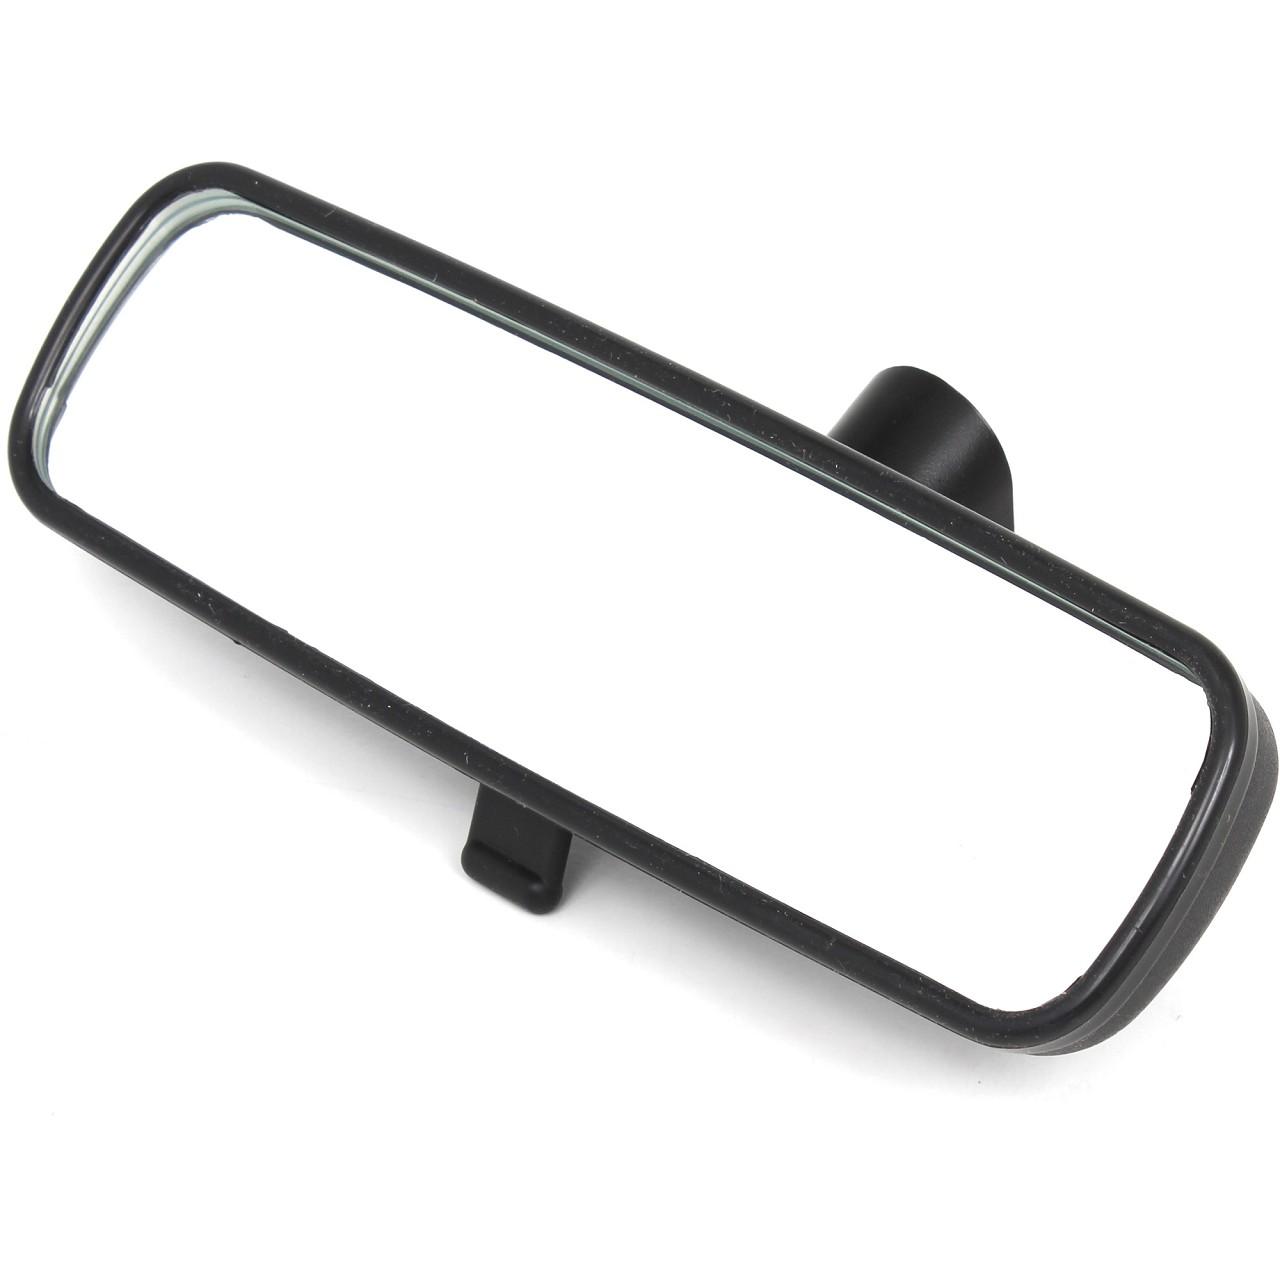 ORIGINAL Ford Innenspiegel Rückspiegel 015478 Fiesta V Focus Mondeo III 4982463